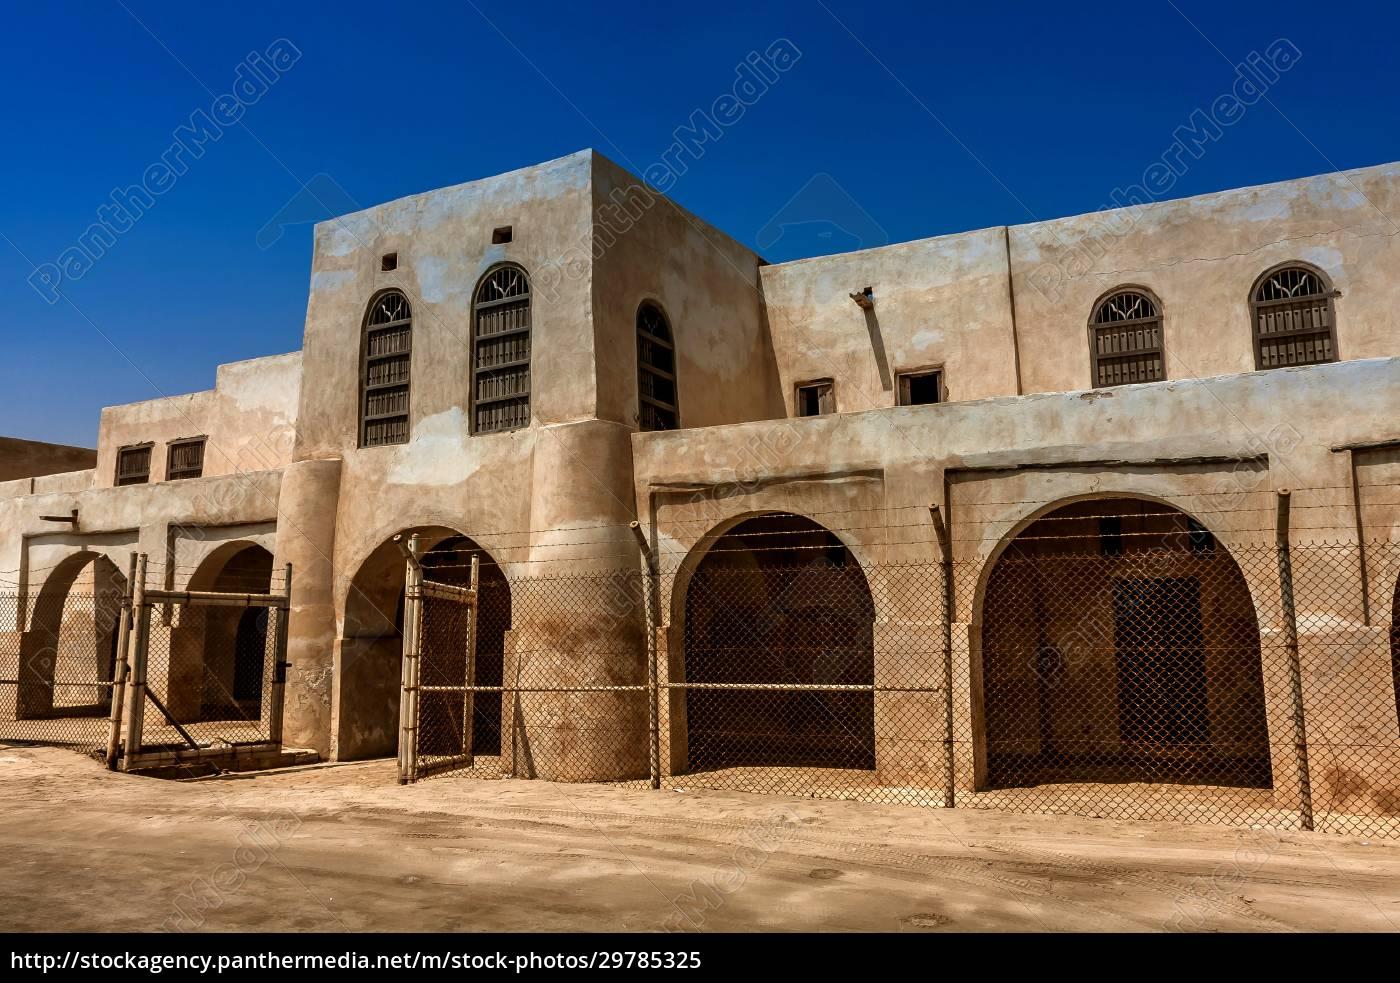 a, facade, and, entrance, to, aqeer - 29785325